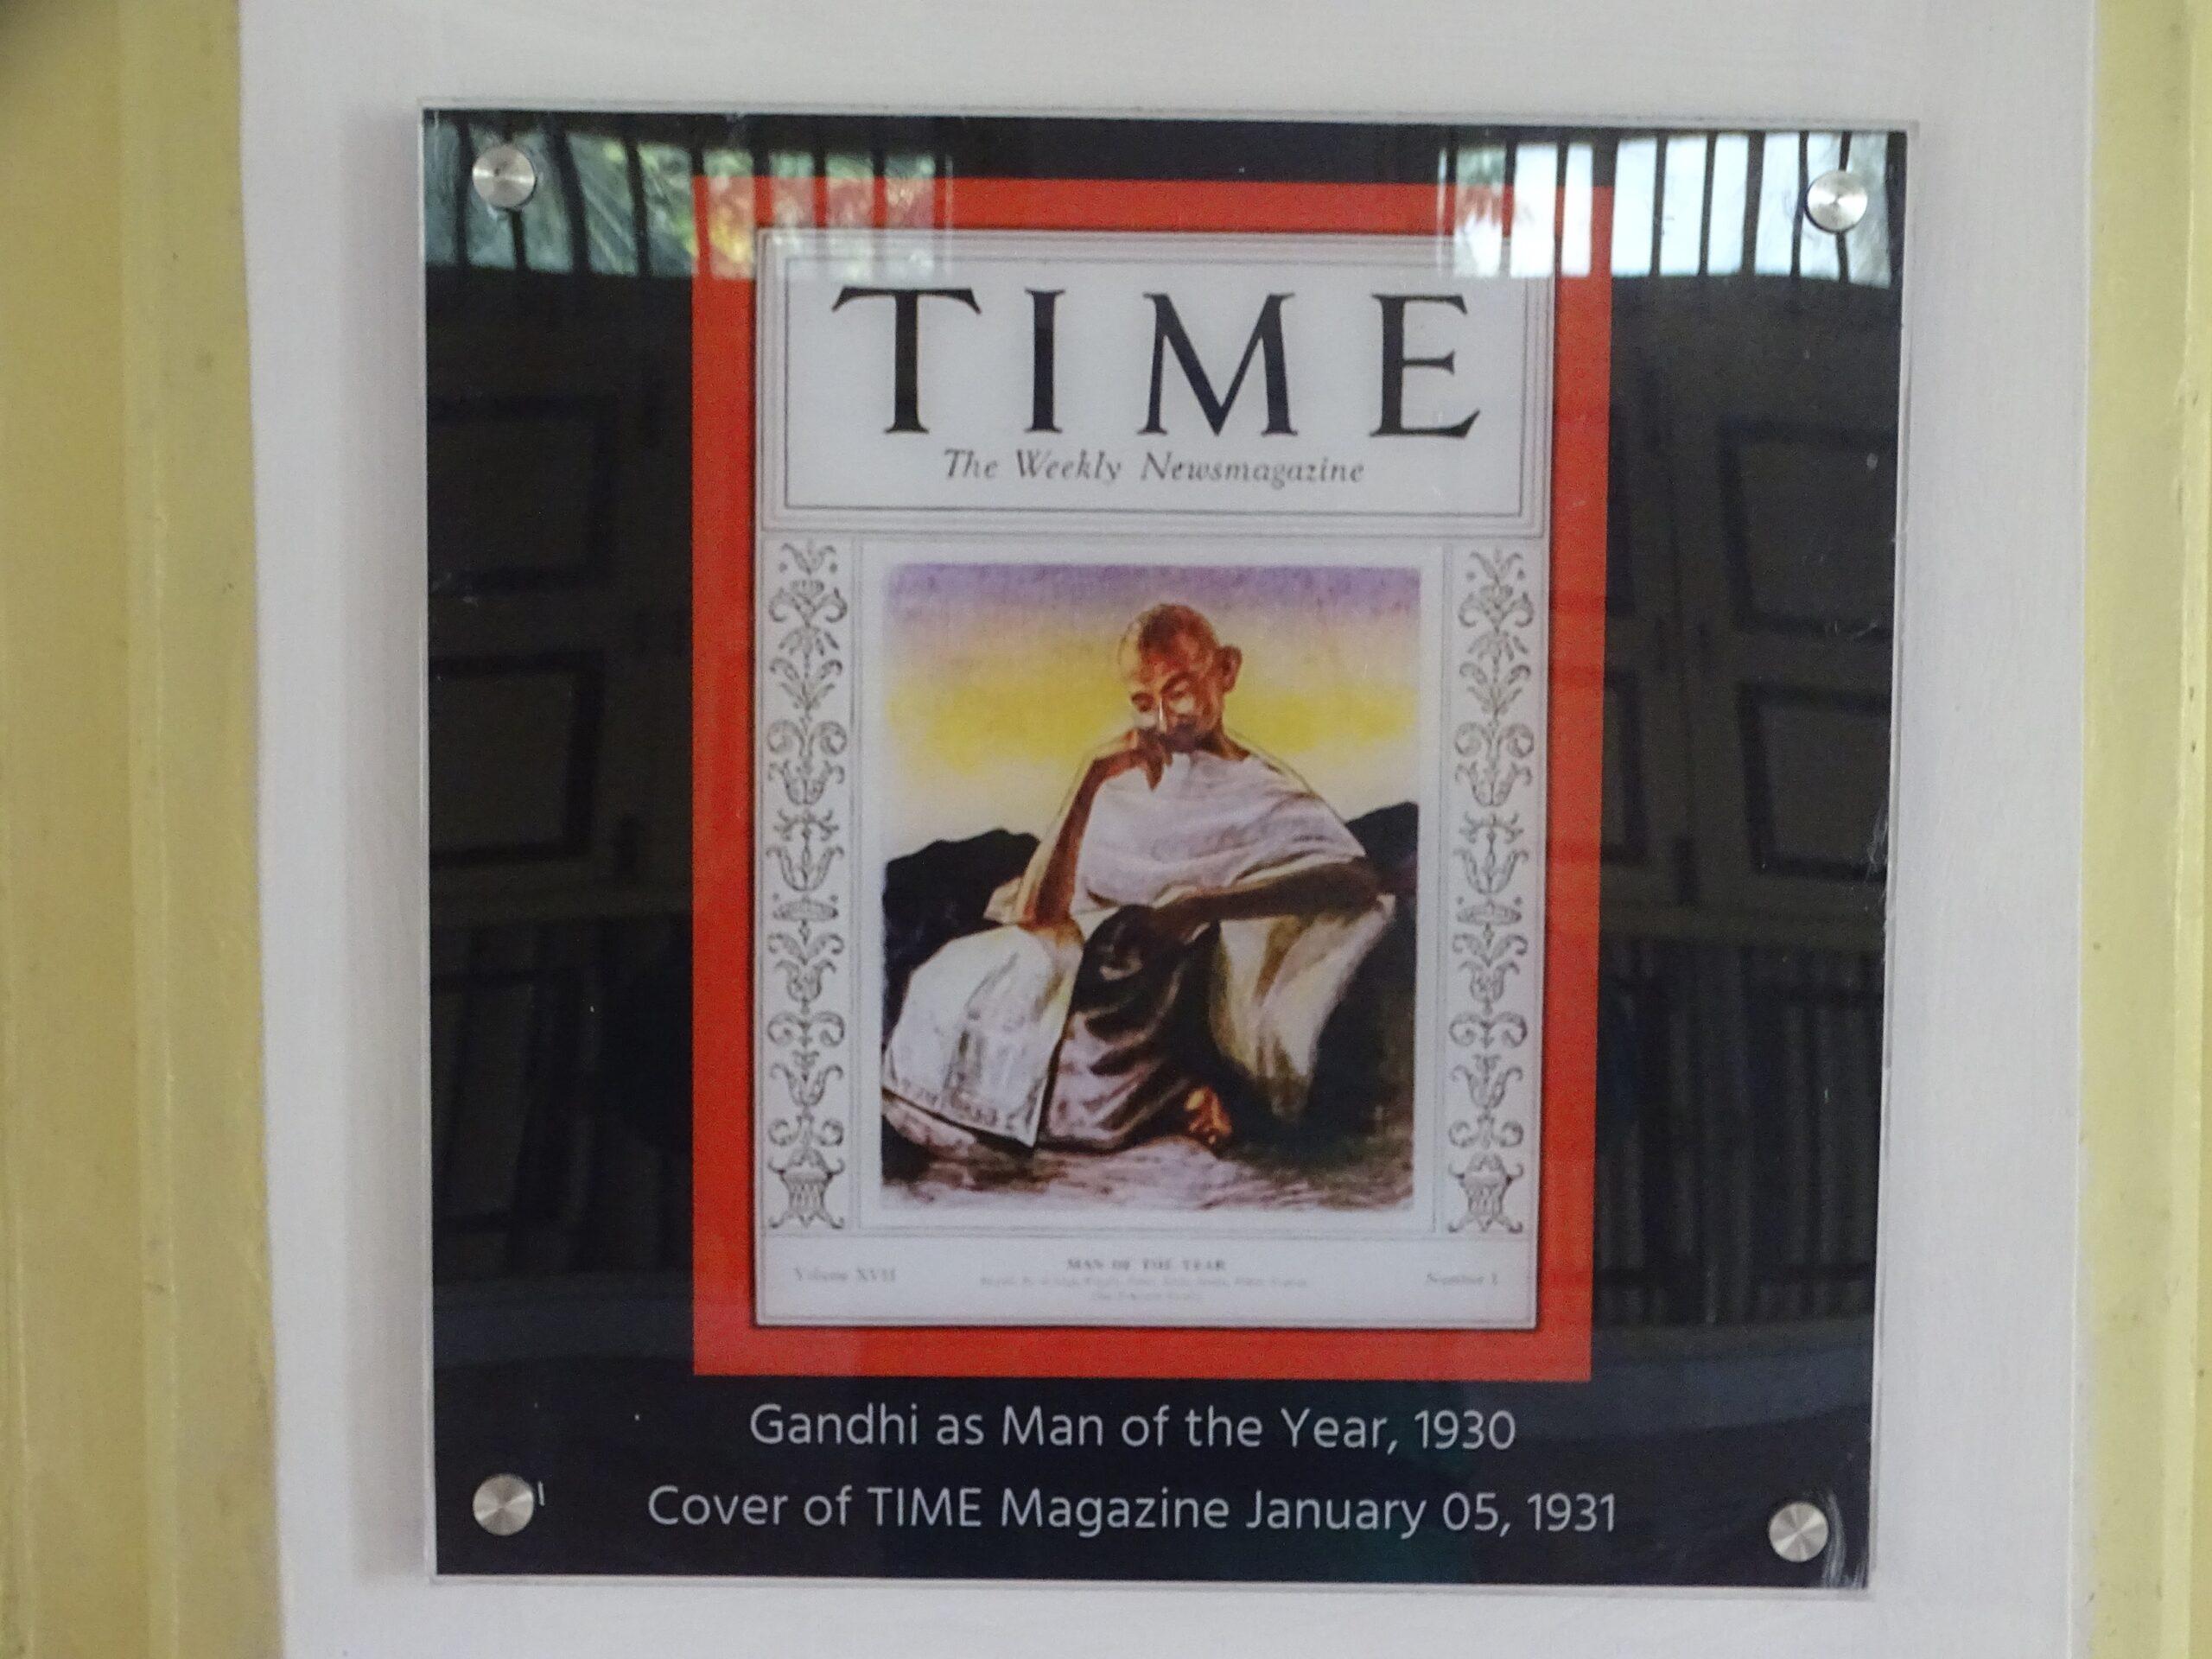 January 05, 1931 - Mahatma Gandhi on The Cover of TIME Magazine